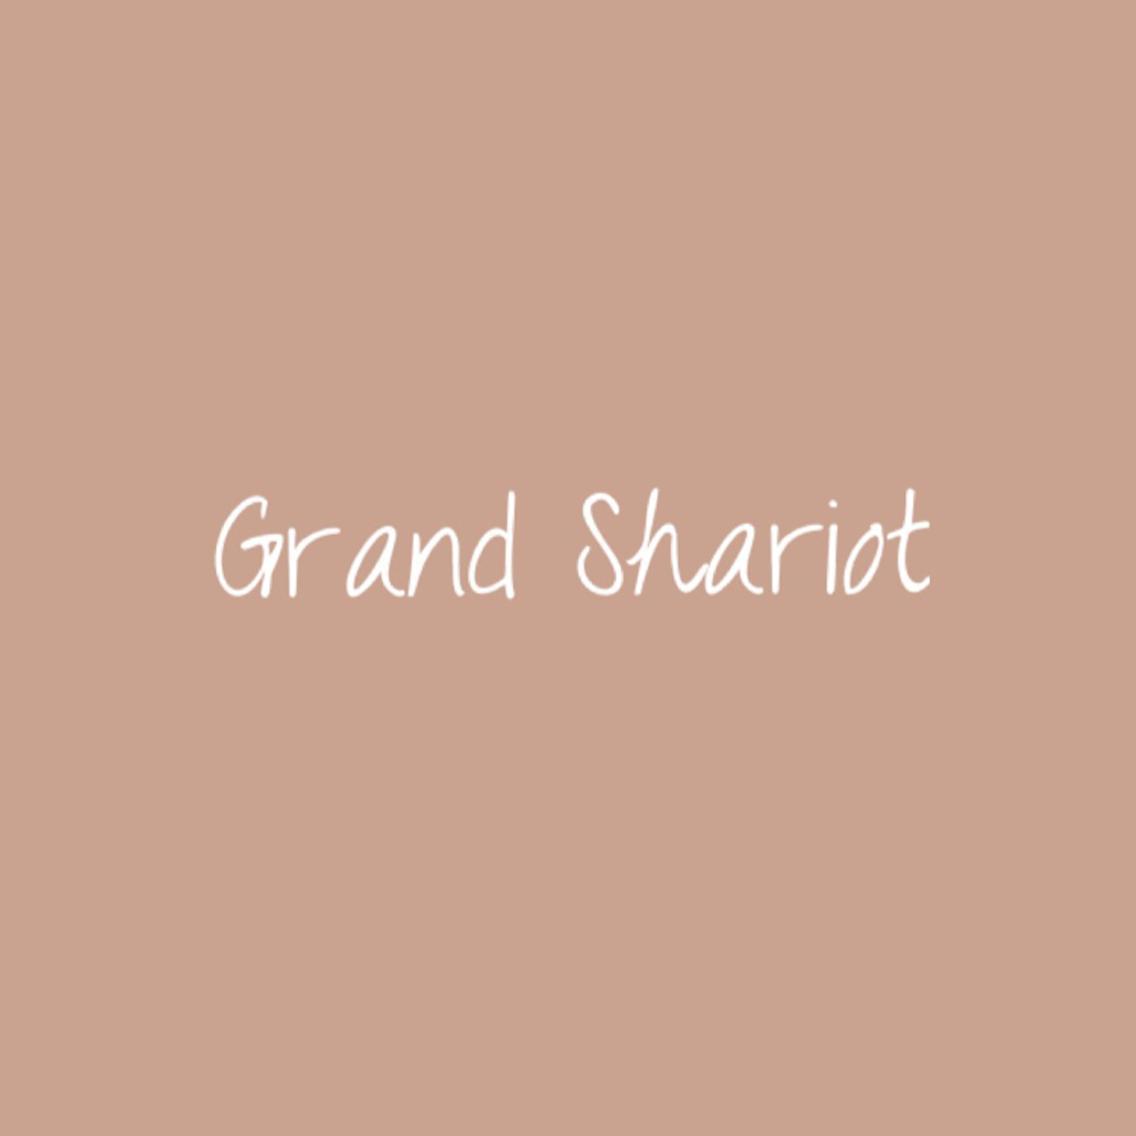 GrandShariot所属・前田亜紀の掲載